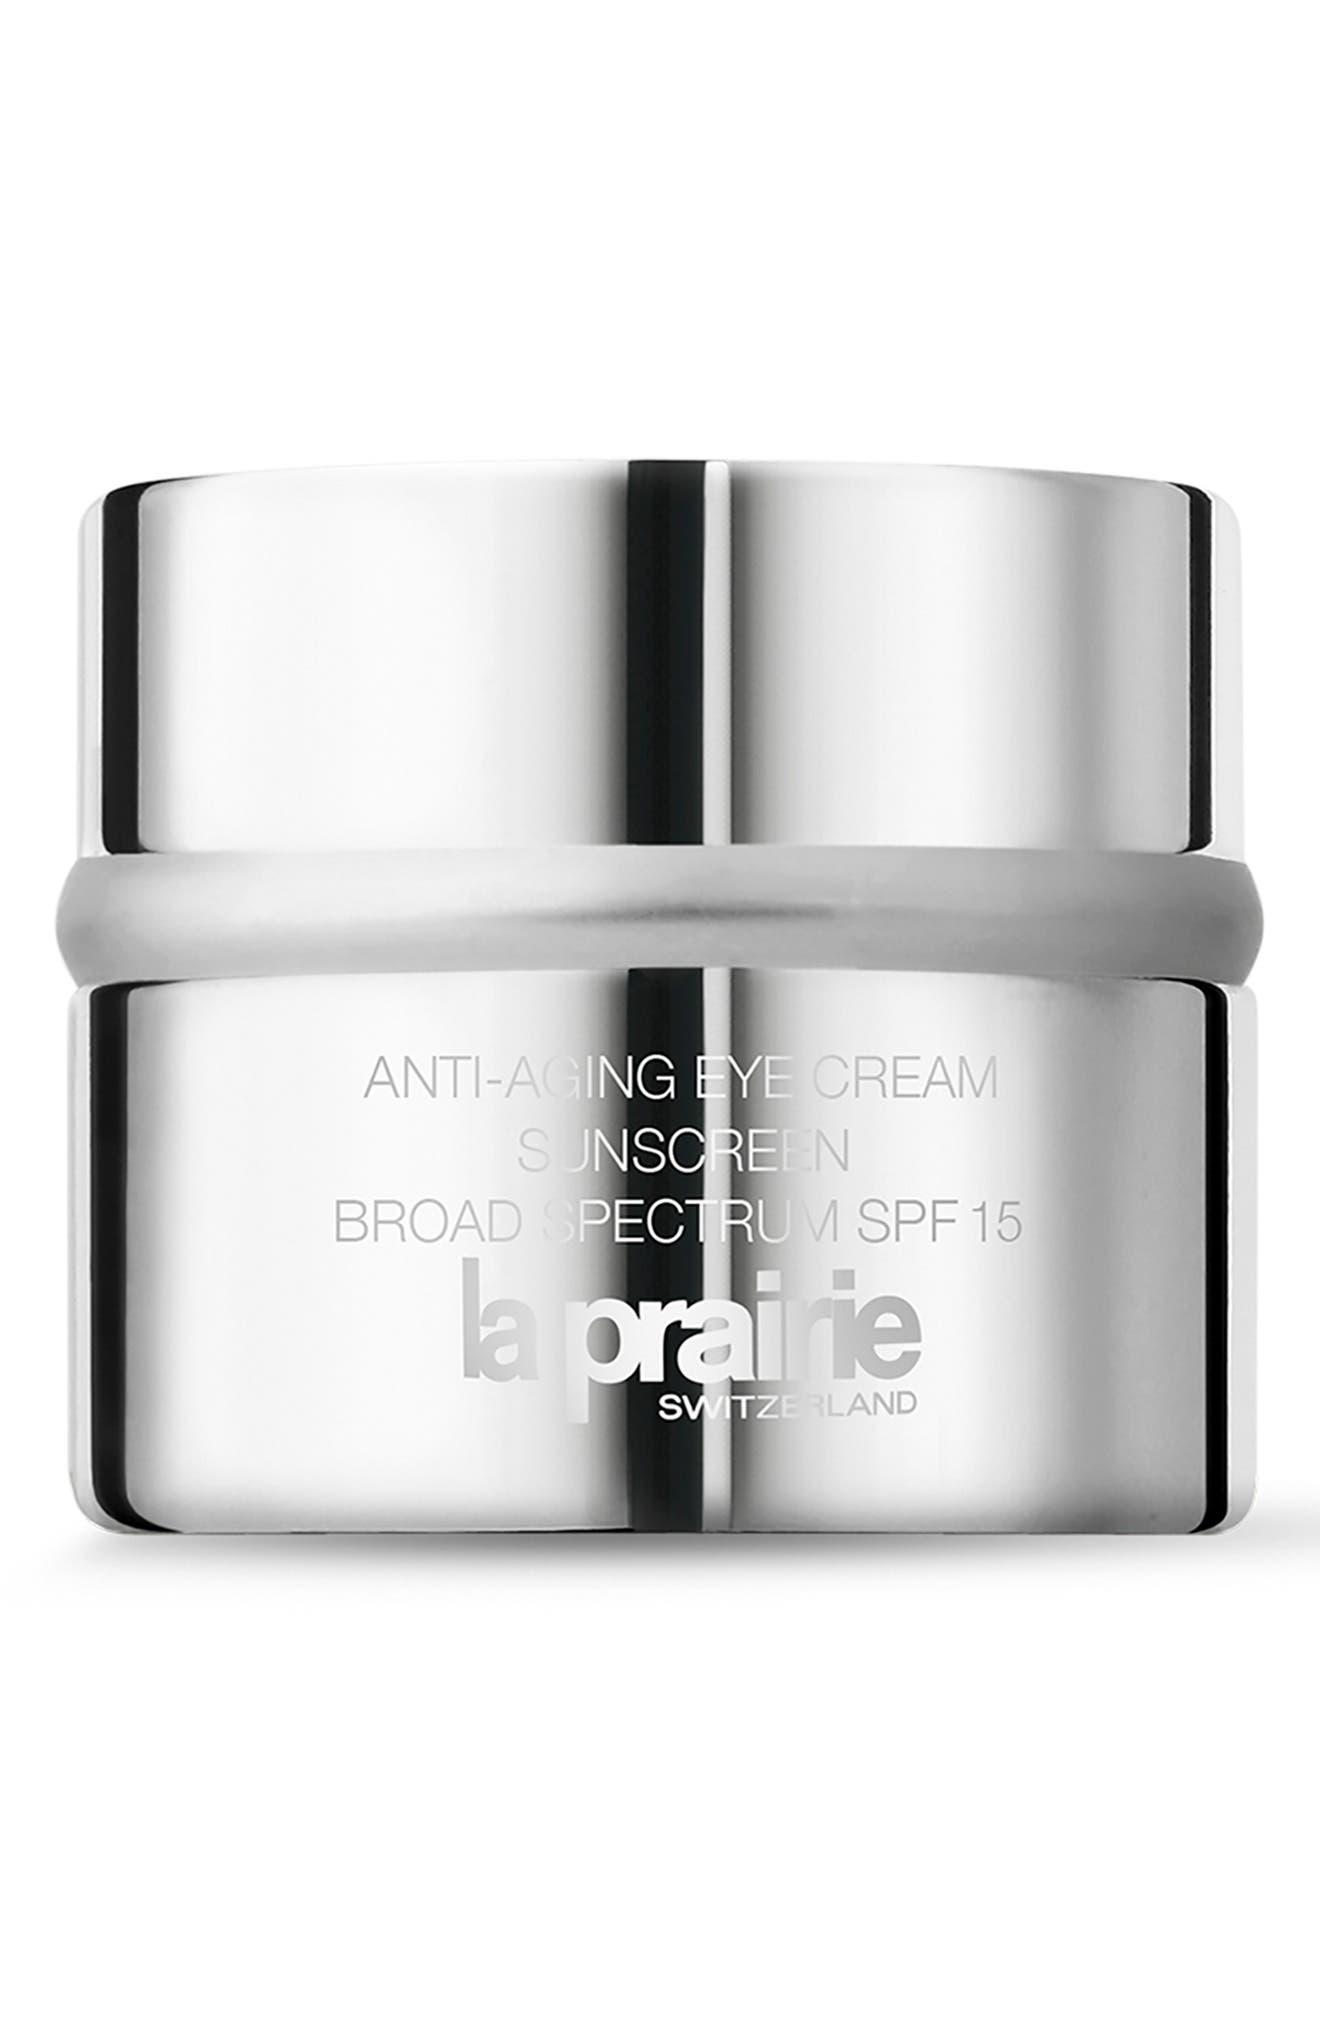 LA PRAIRIE Anti-Aging Eye Cream Sunscreen Broad Spectrum SPF 15, Main, color, NO COLOR